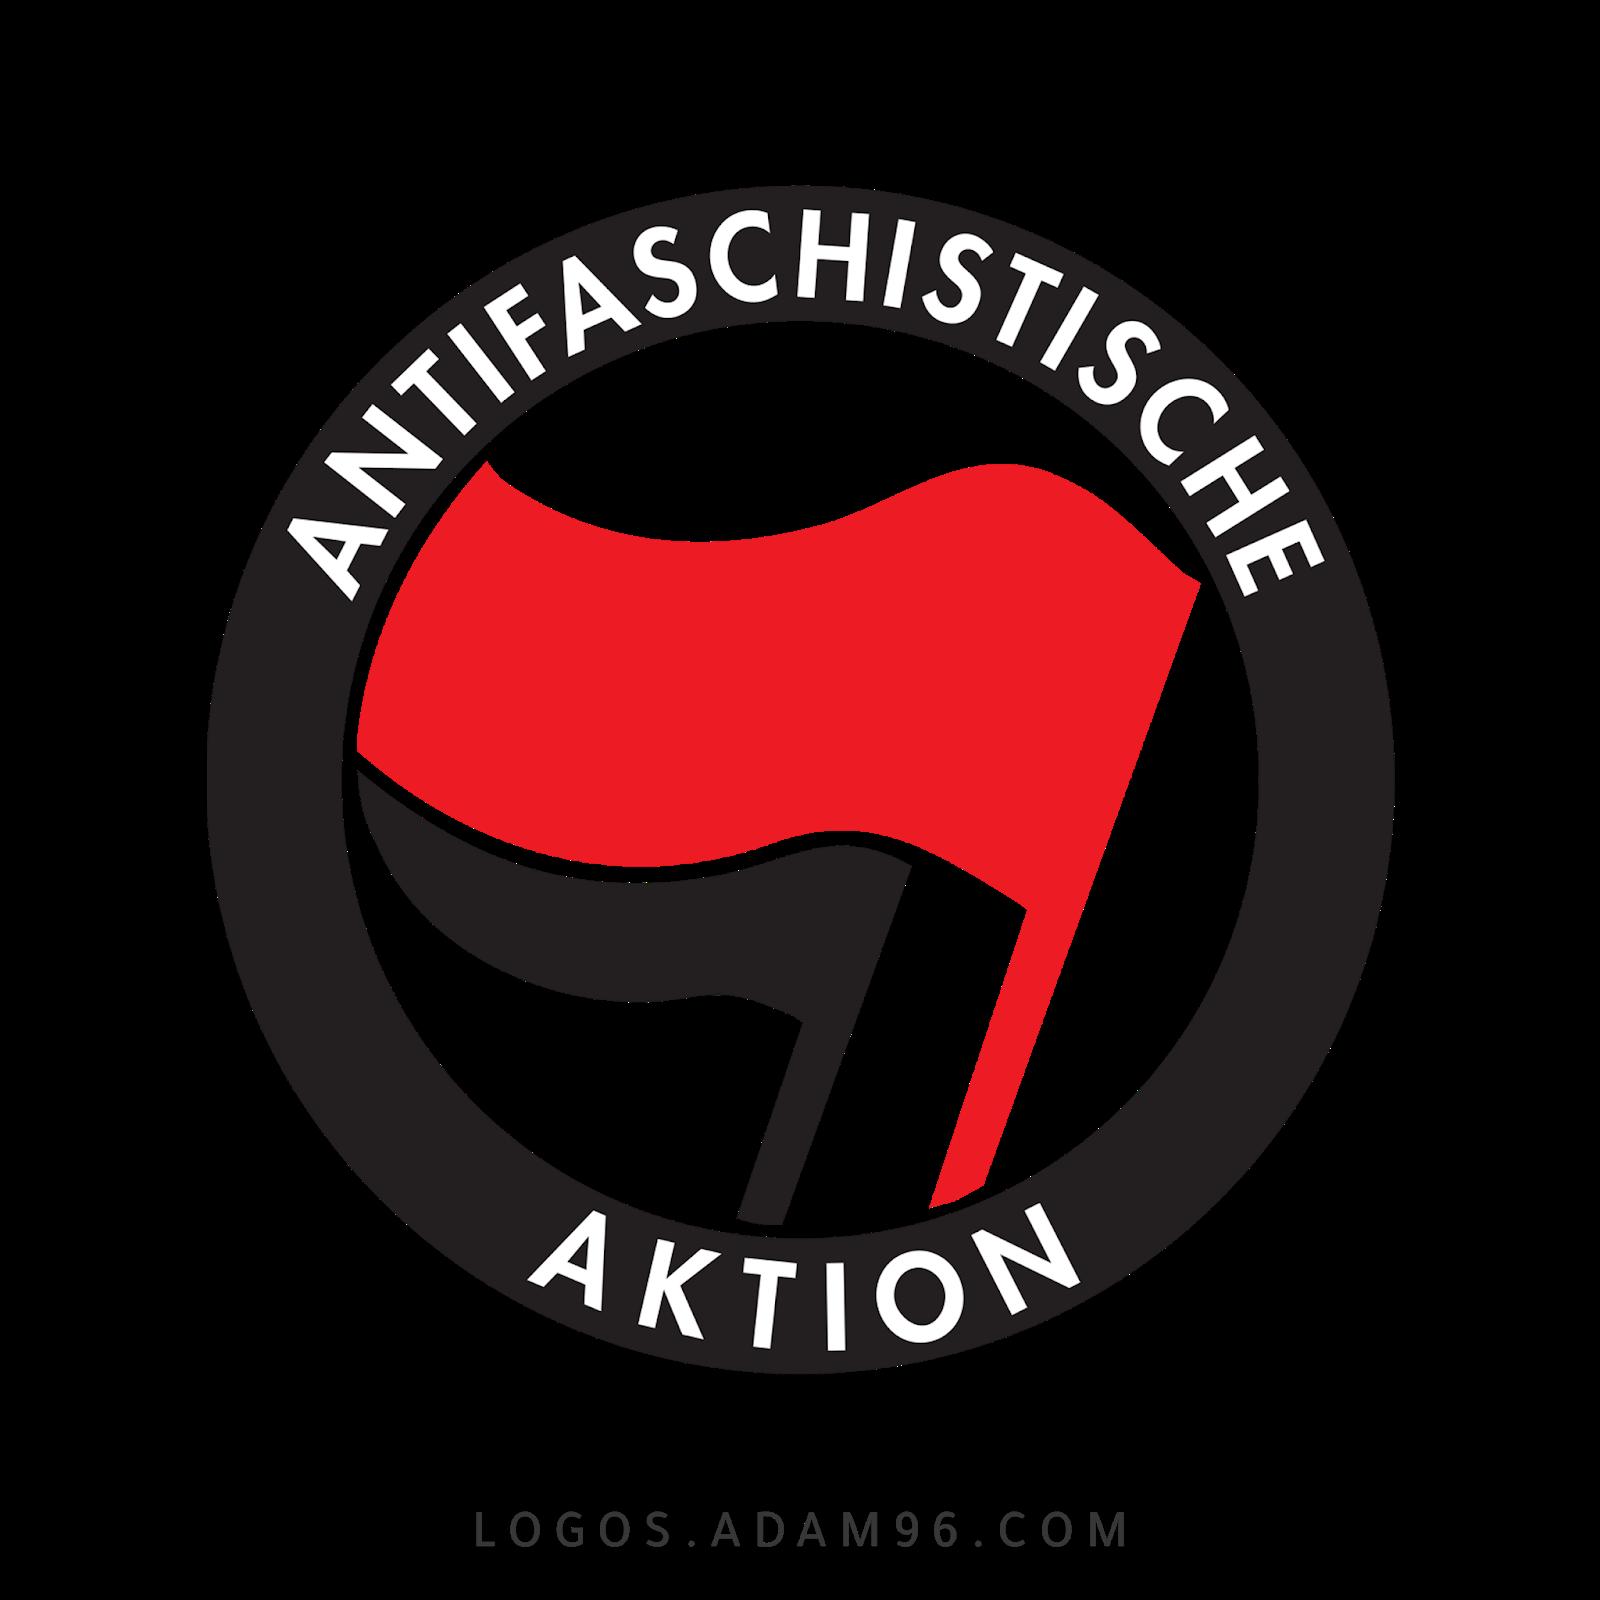 Movement Antifa